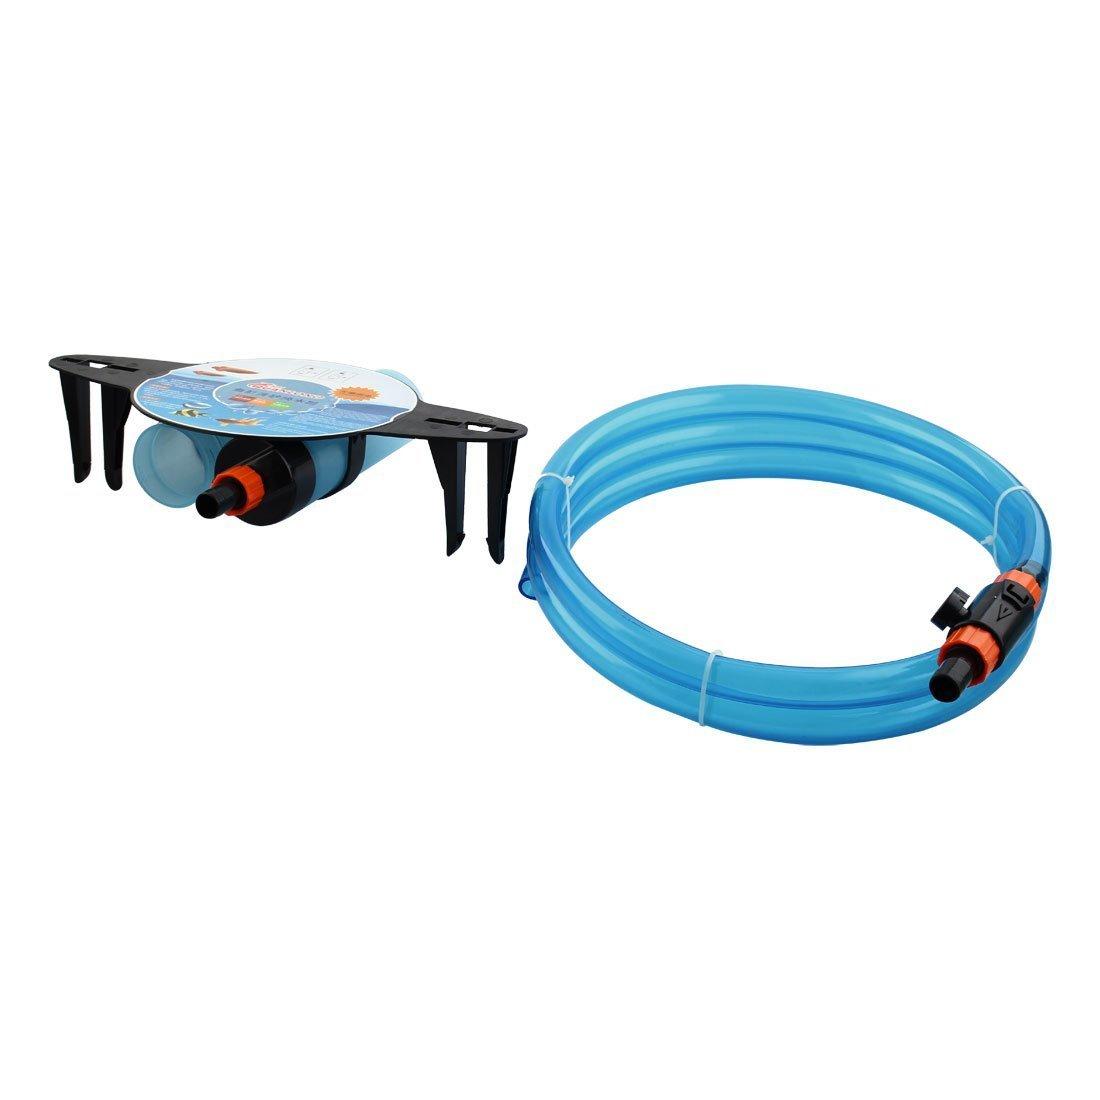 1Pc Plastic Aquarium Fish Tank Water Changer Sand Washer Gravel Vacuum Cleaner Light bluee w Control Valve